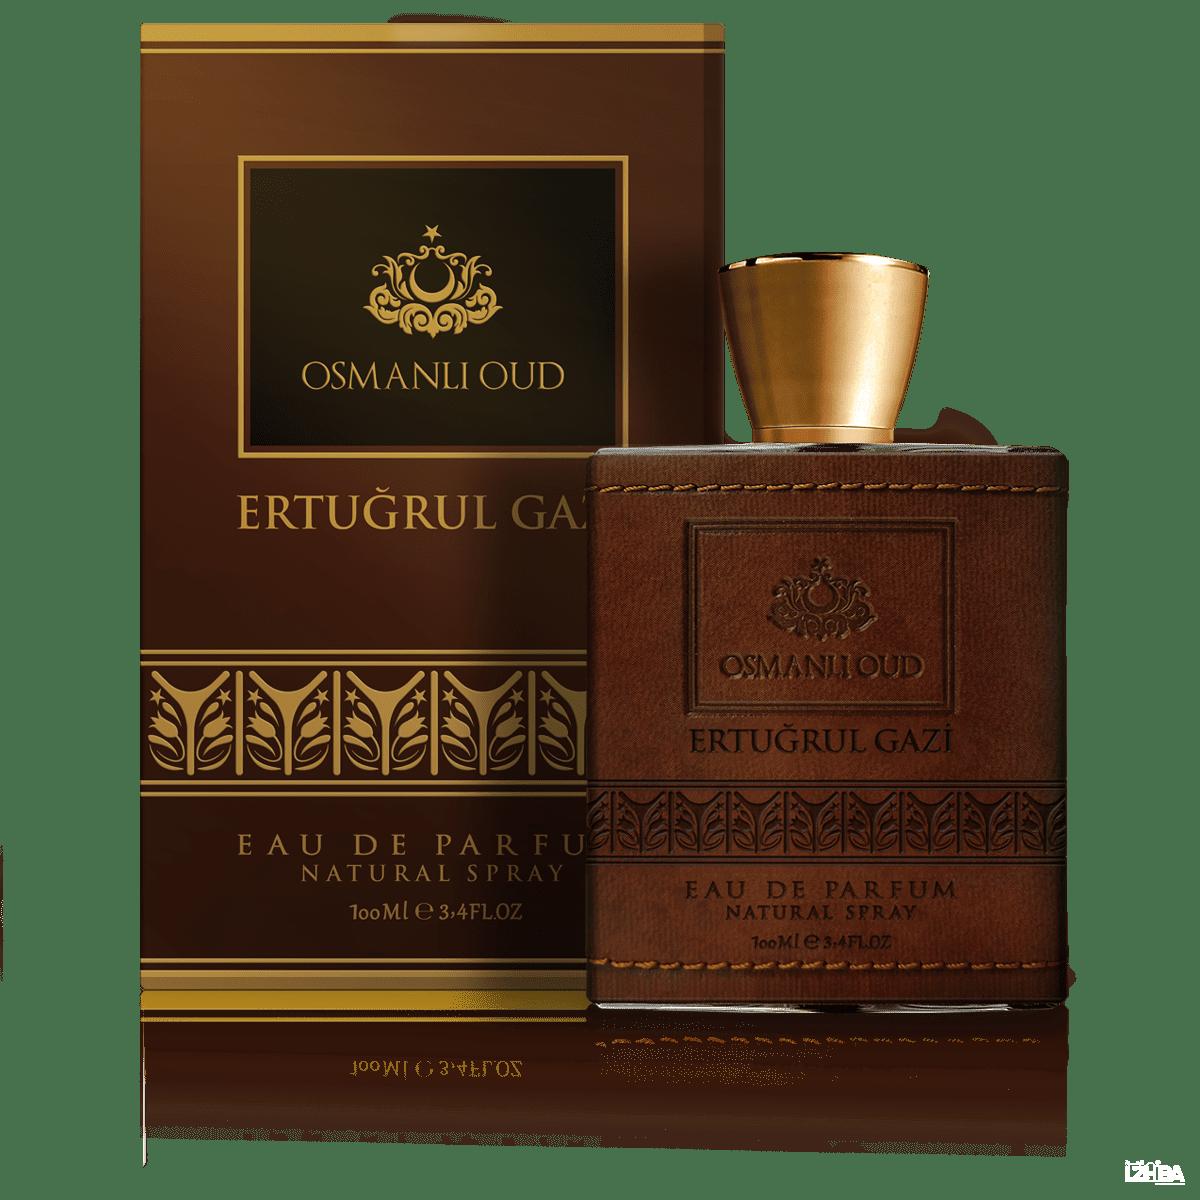 Ertugrul Gazi EDP Perfume 100 ML